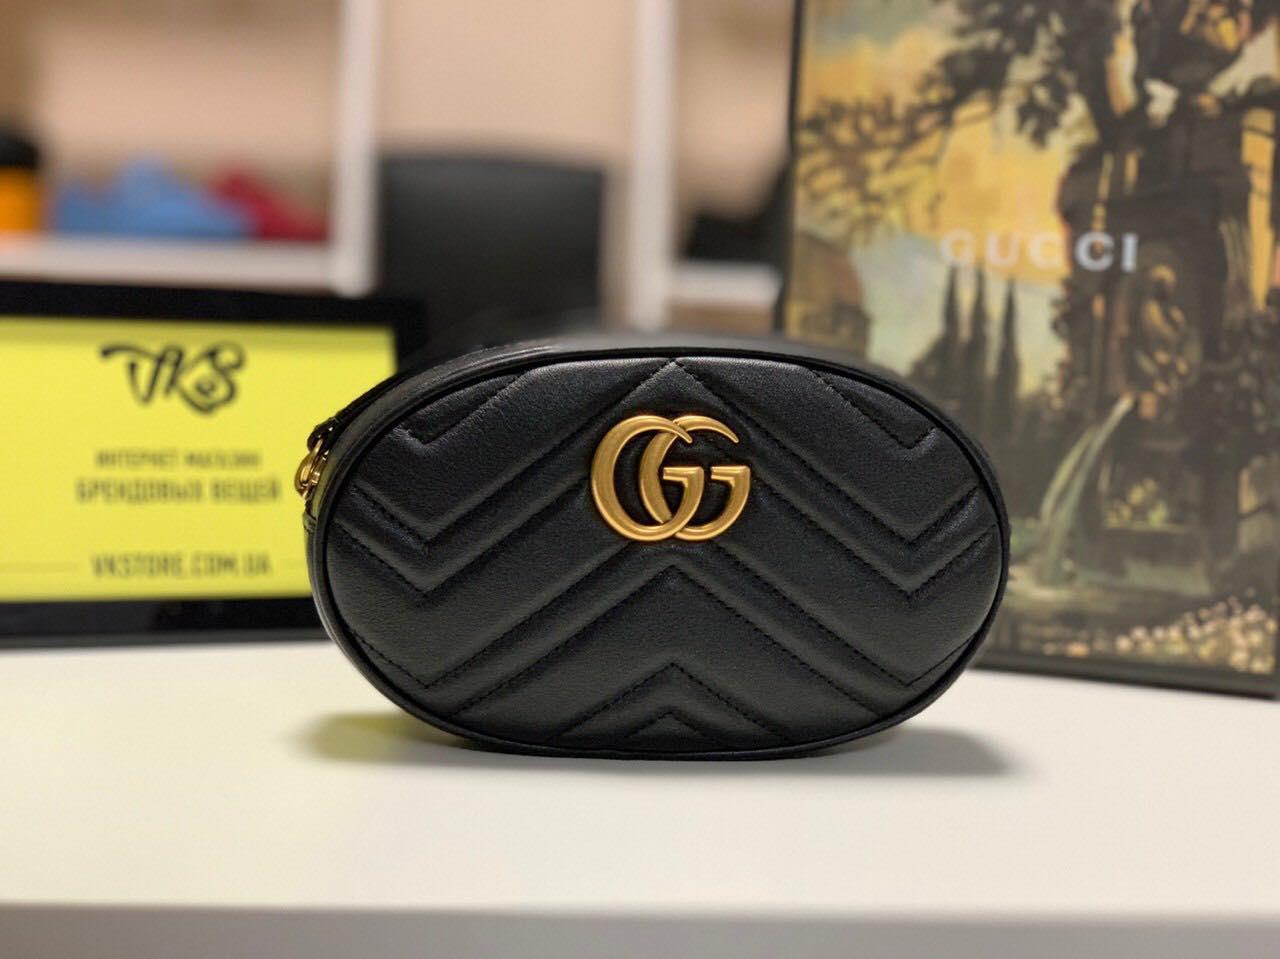 Поясная сумка GG Marmont Gucci (Гуччи) арт. 04-13